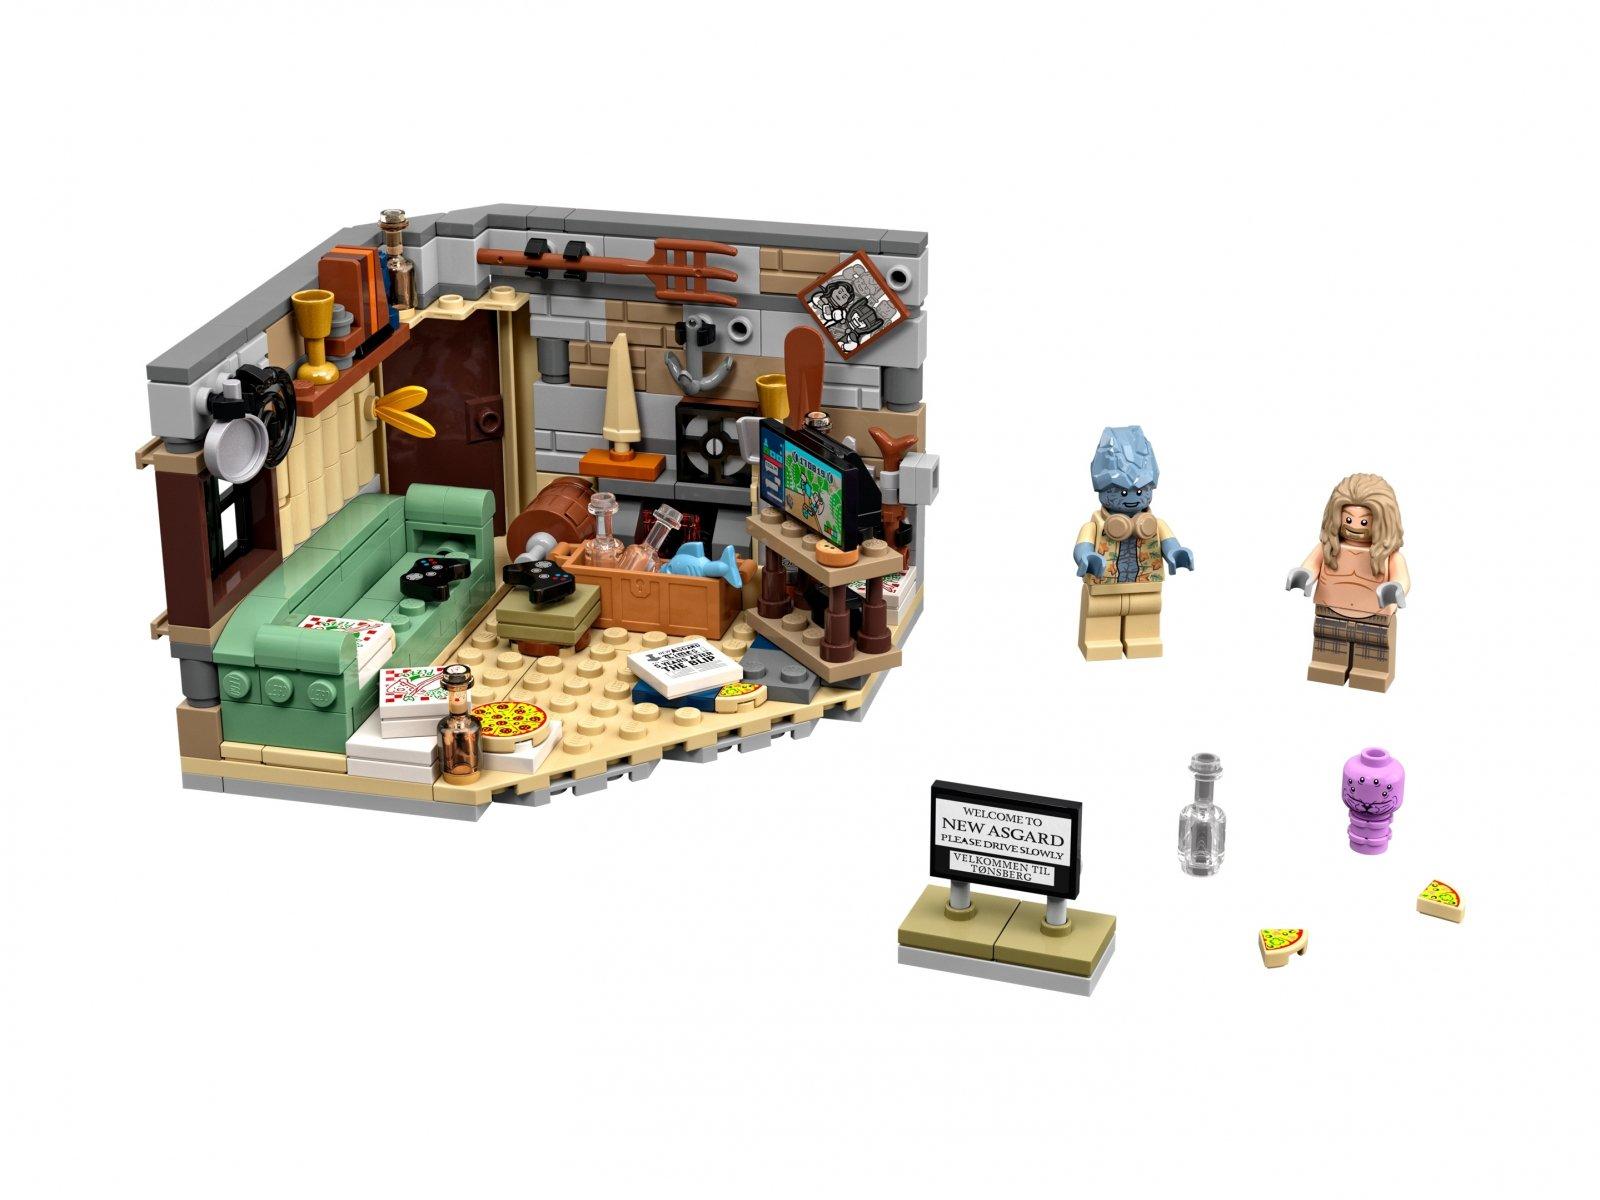 LEGO 76200 Nowy Asgard Grubego Thora